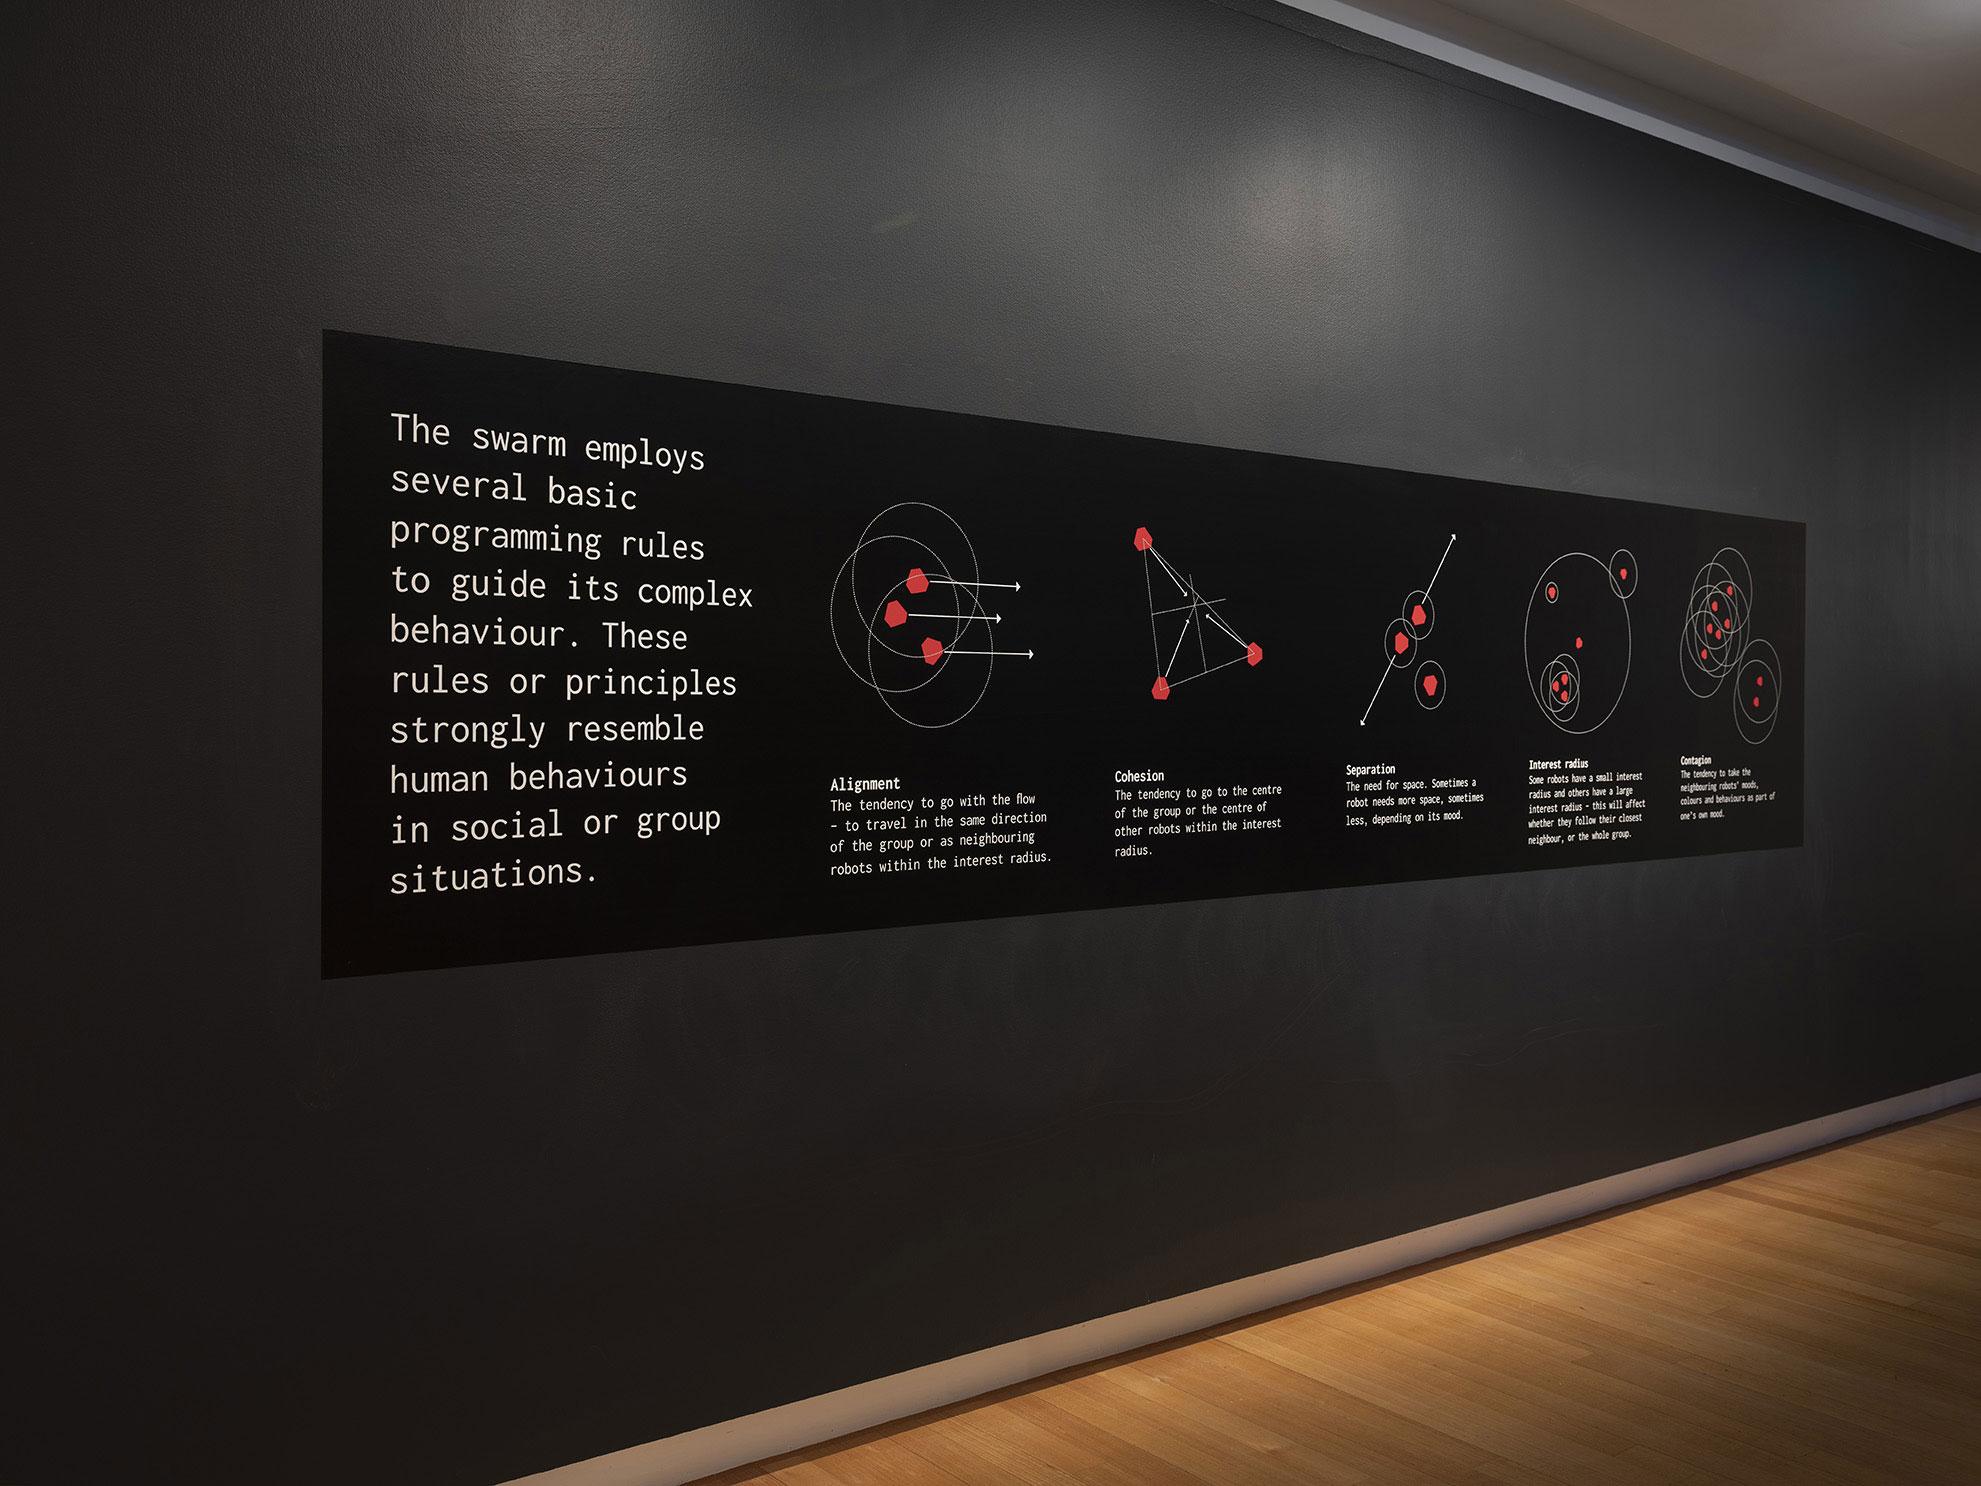 Installation view of 'Empathy swarm' (17 August - 27 October), QUT Art Museum, 2019. Image copyright Carl Warner.